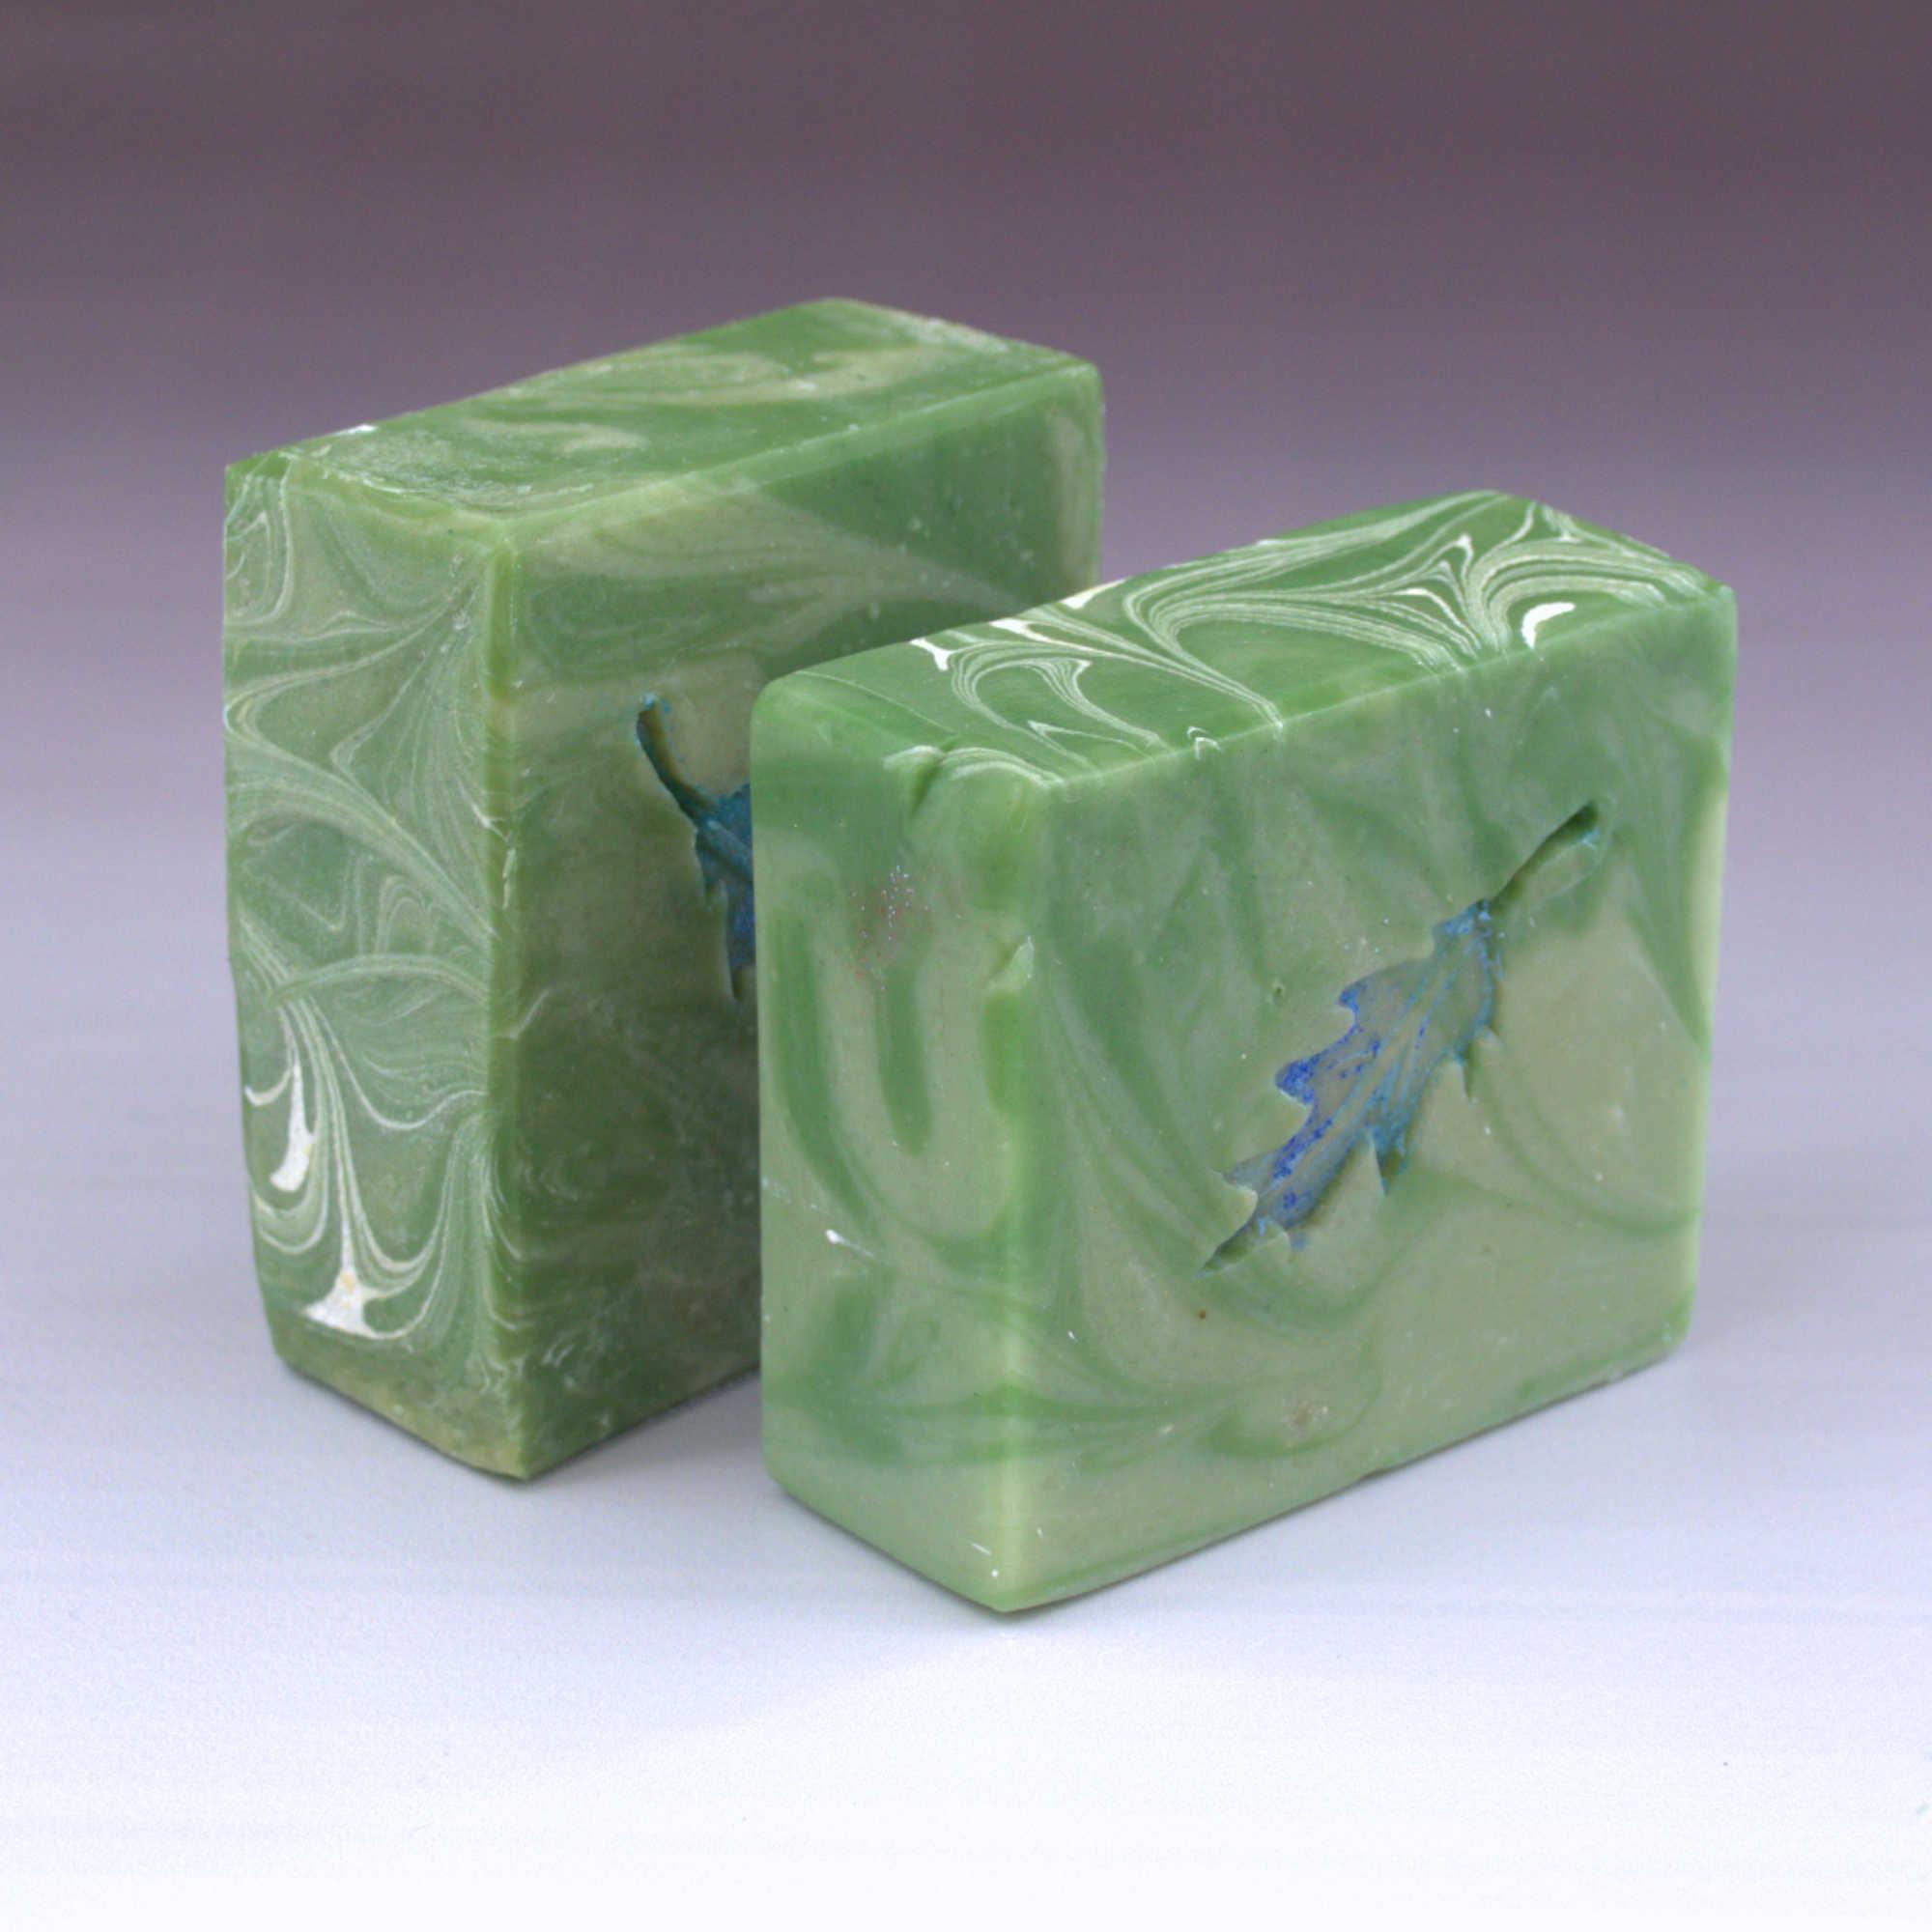 Reminiscence Soap